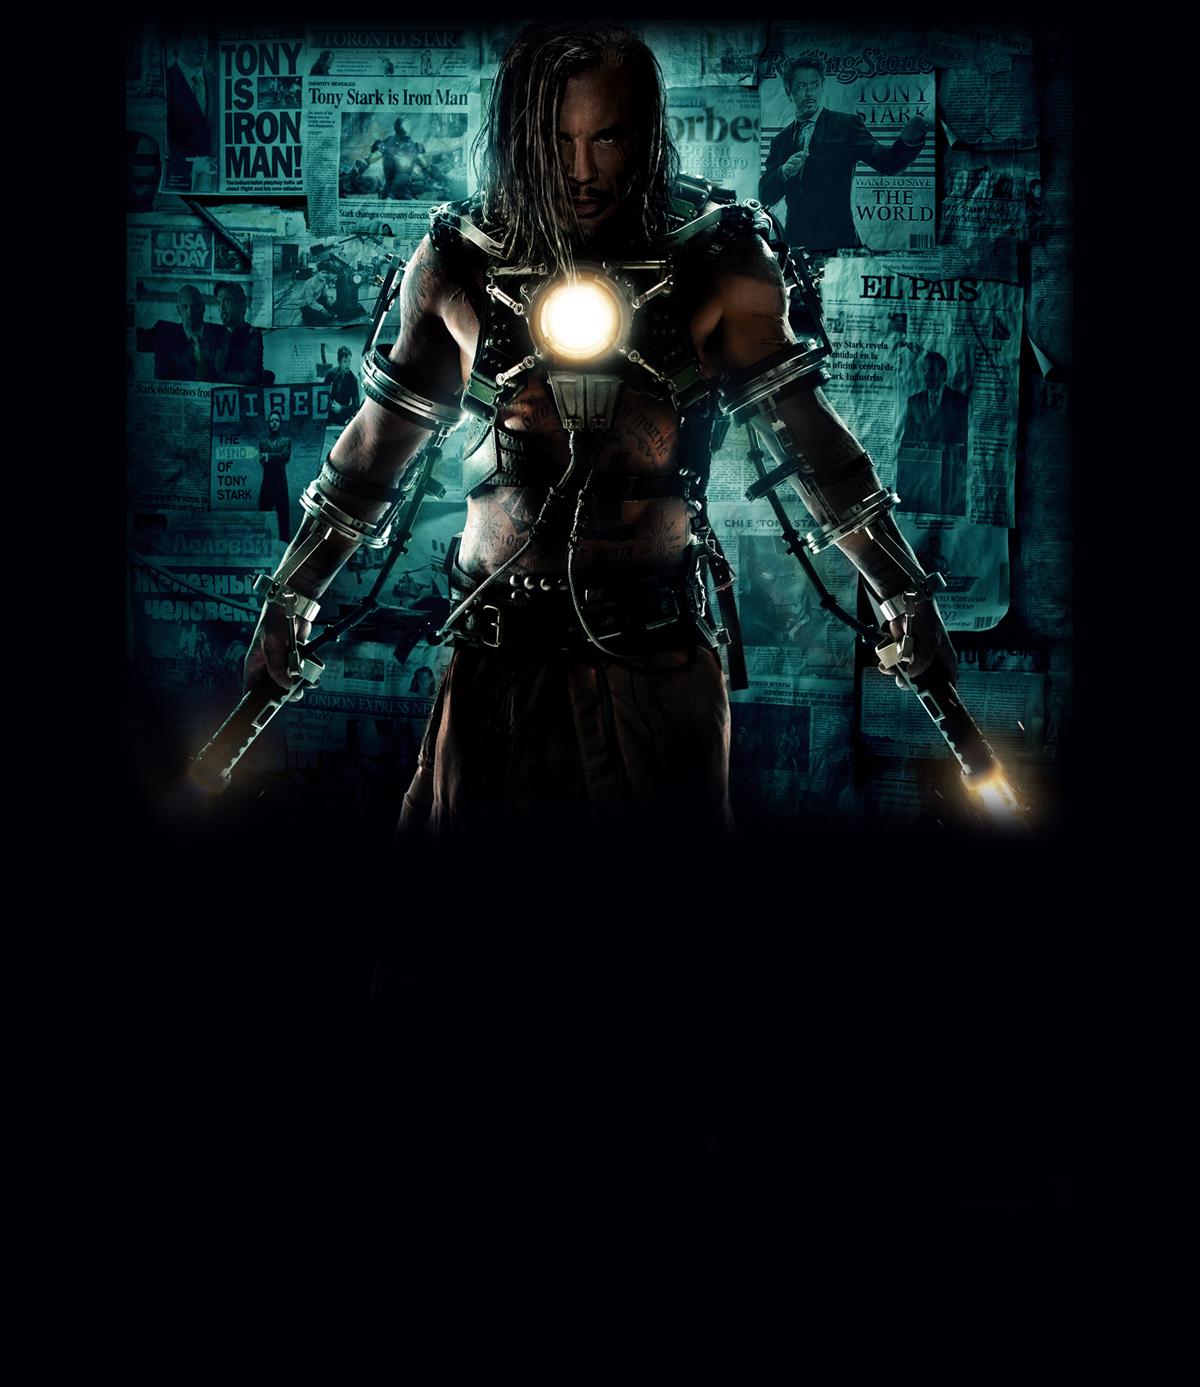 Iron Man 2 - Movie Trailers -